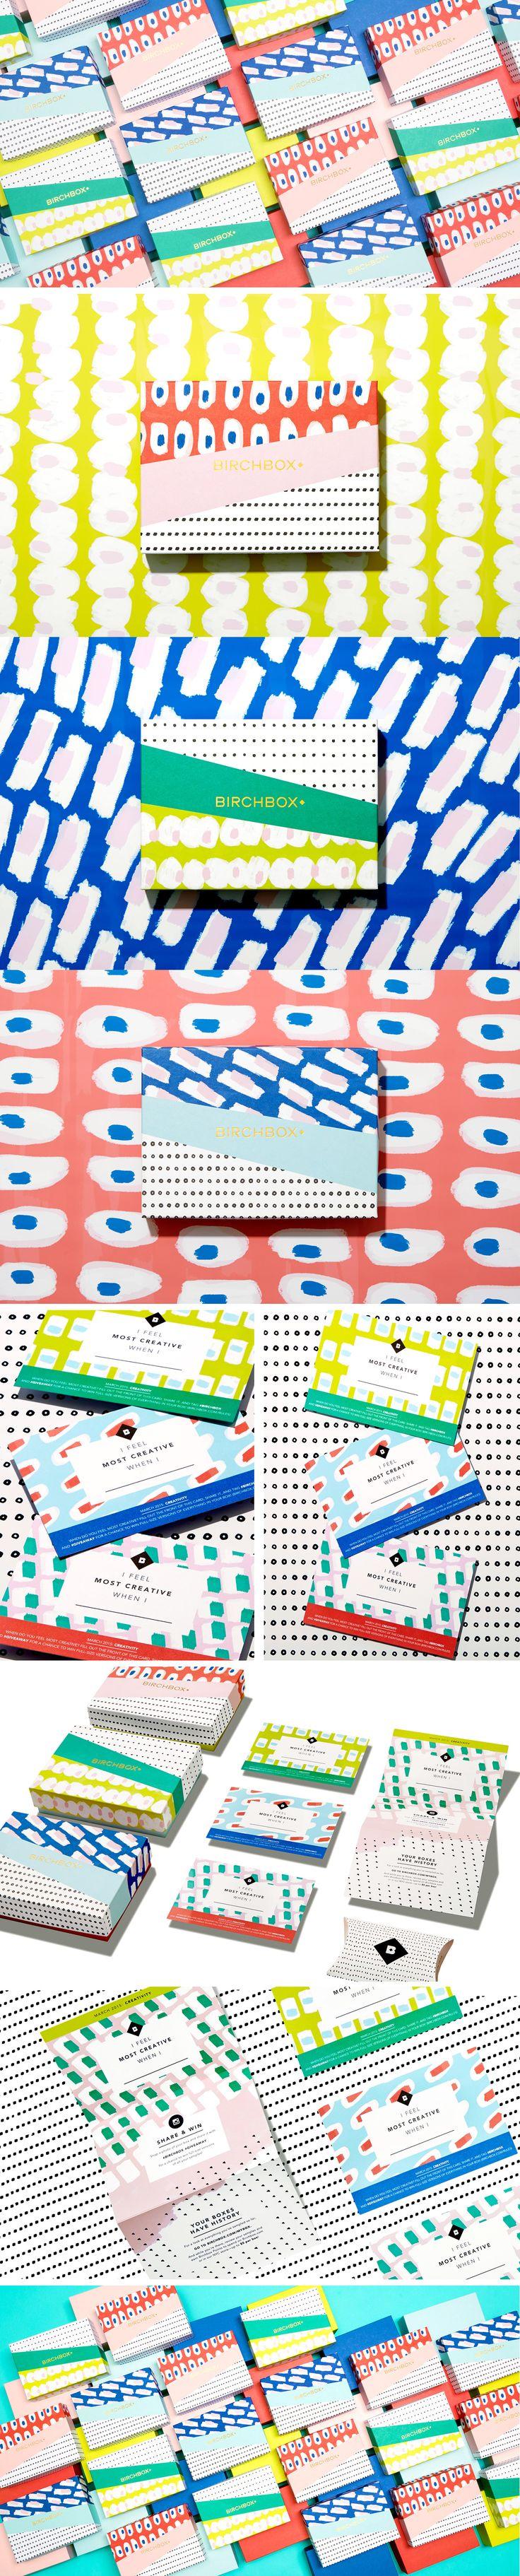 Birchbox March 2015 Subscription Box on Behance   by Mary Rabun